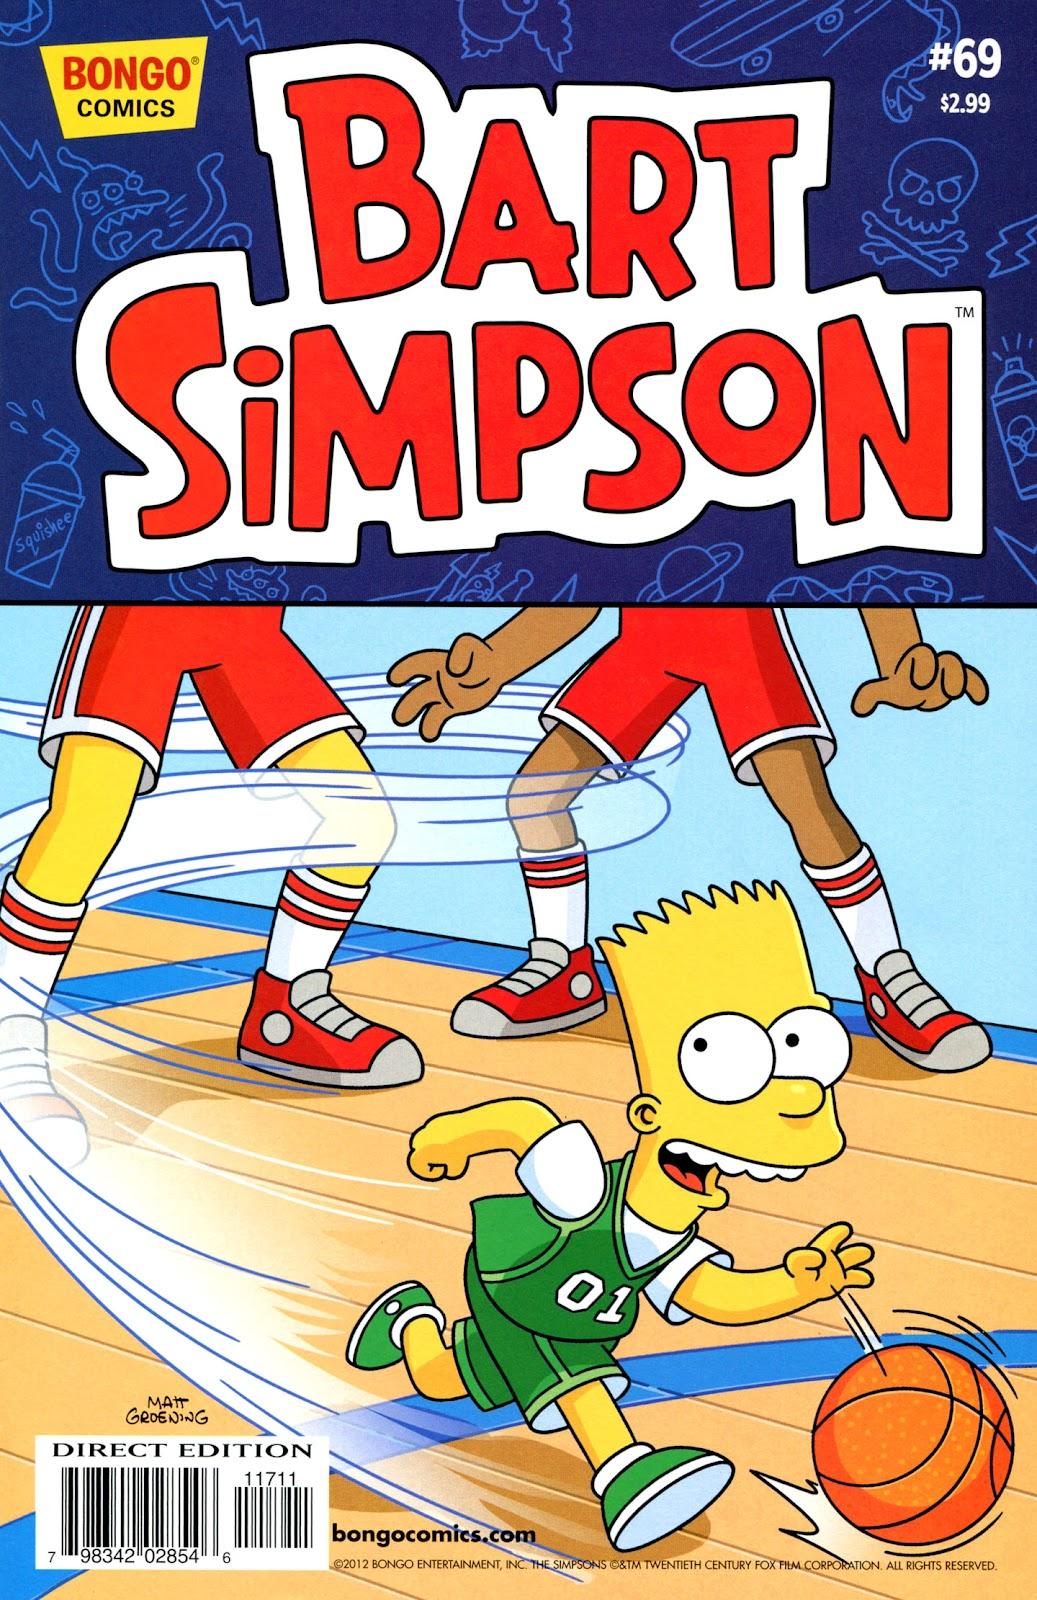 Simpsons Comics Presents Bart Simpson 69 Page 1